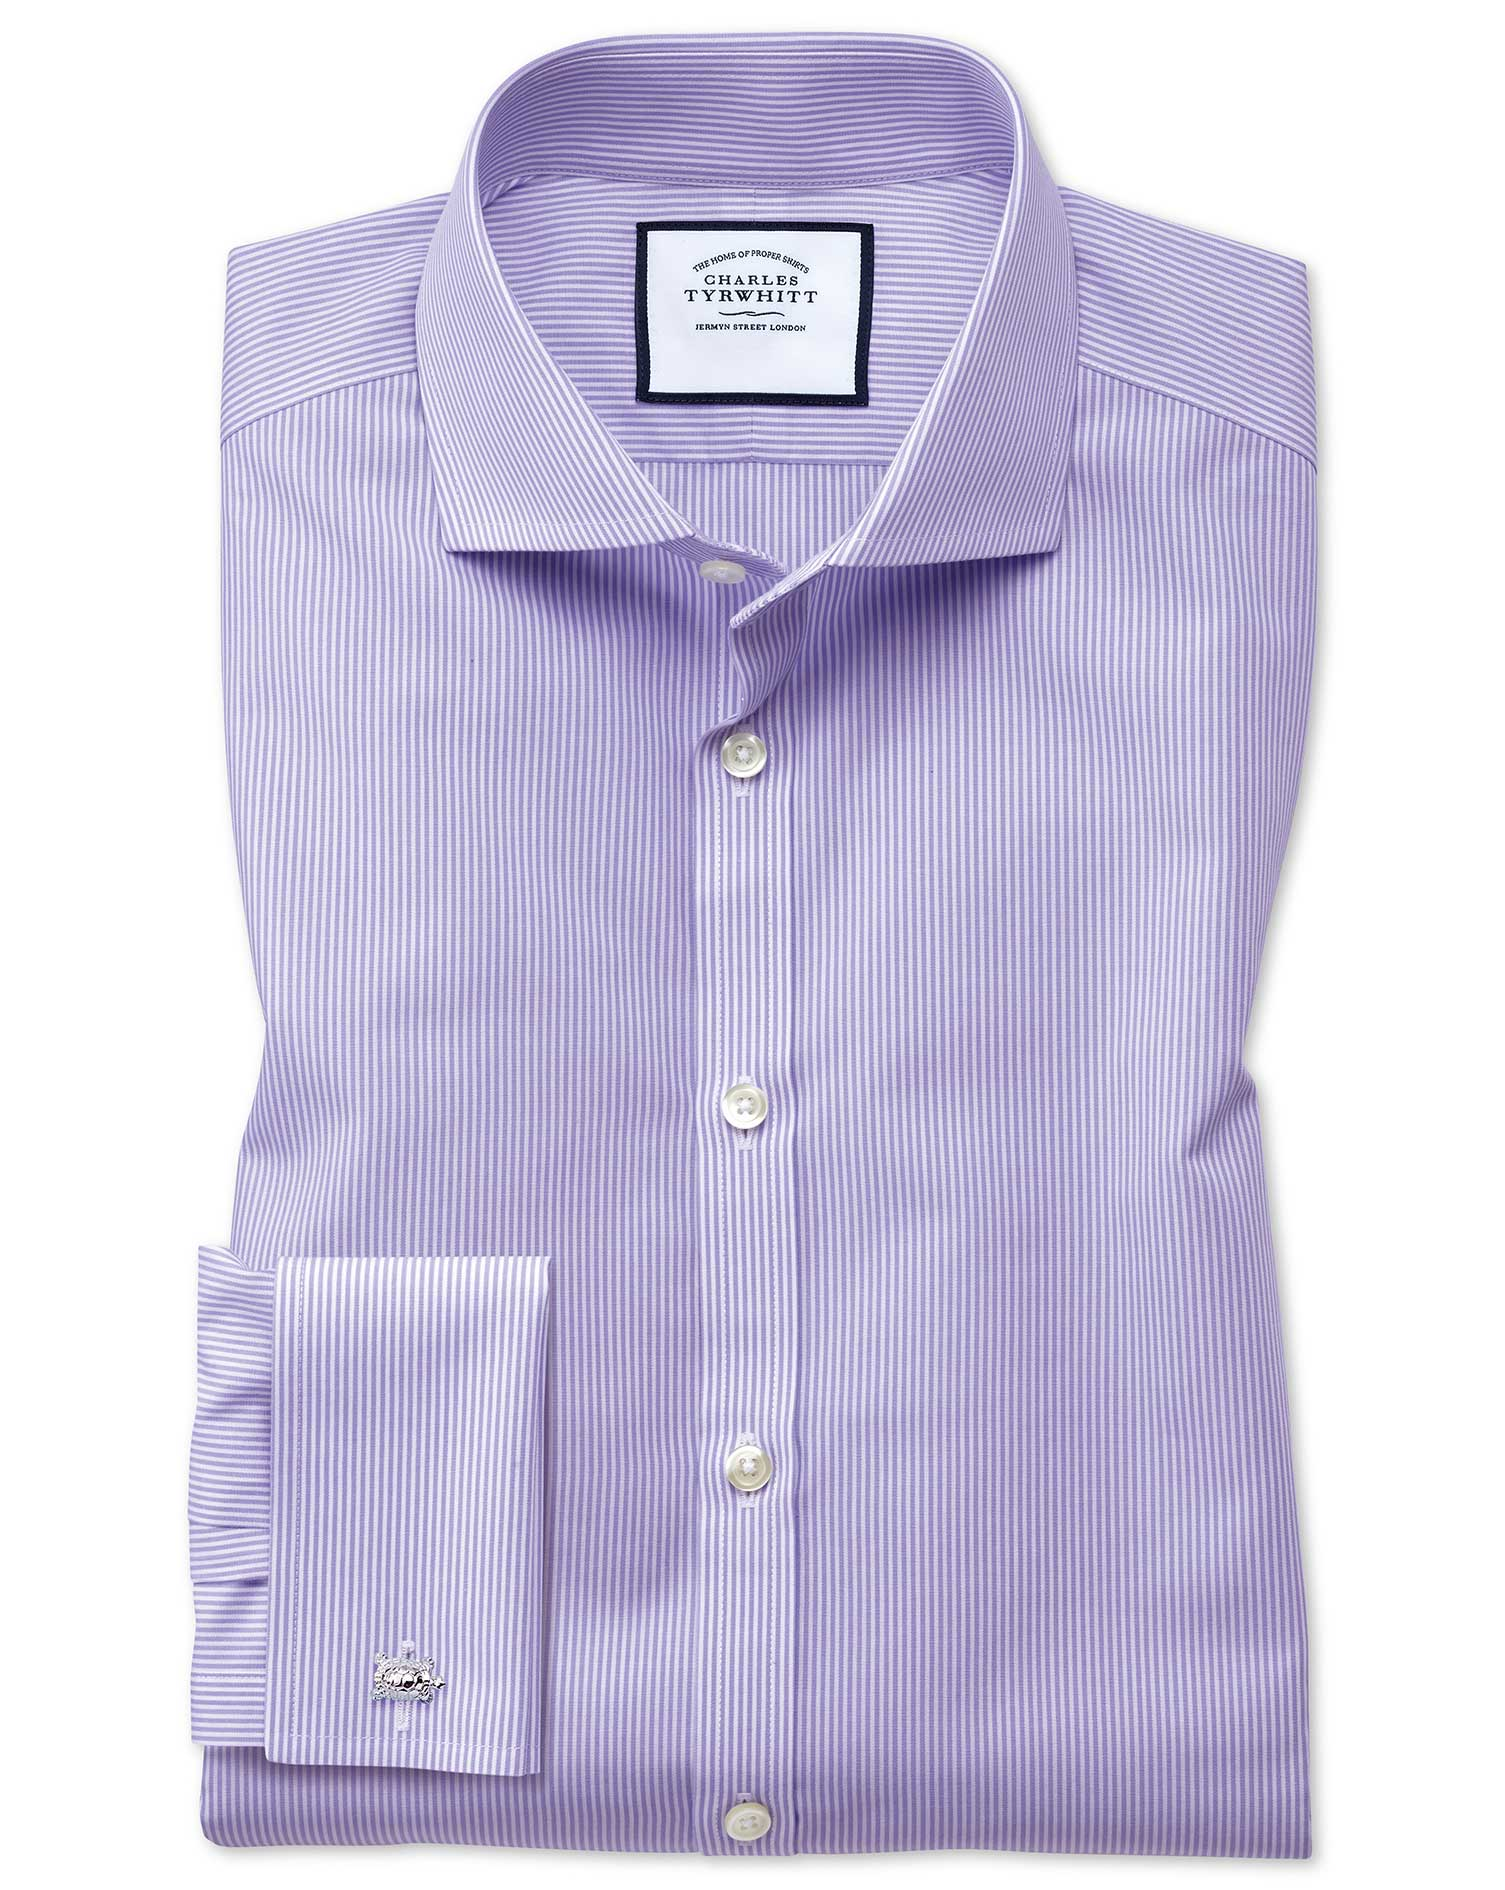 Extra Slim Fit Cutaway Collar Non-Iron Bengal Stripe Lilac Cotton Formal Shirt Single Cuff Size 17.5